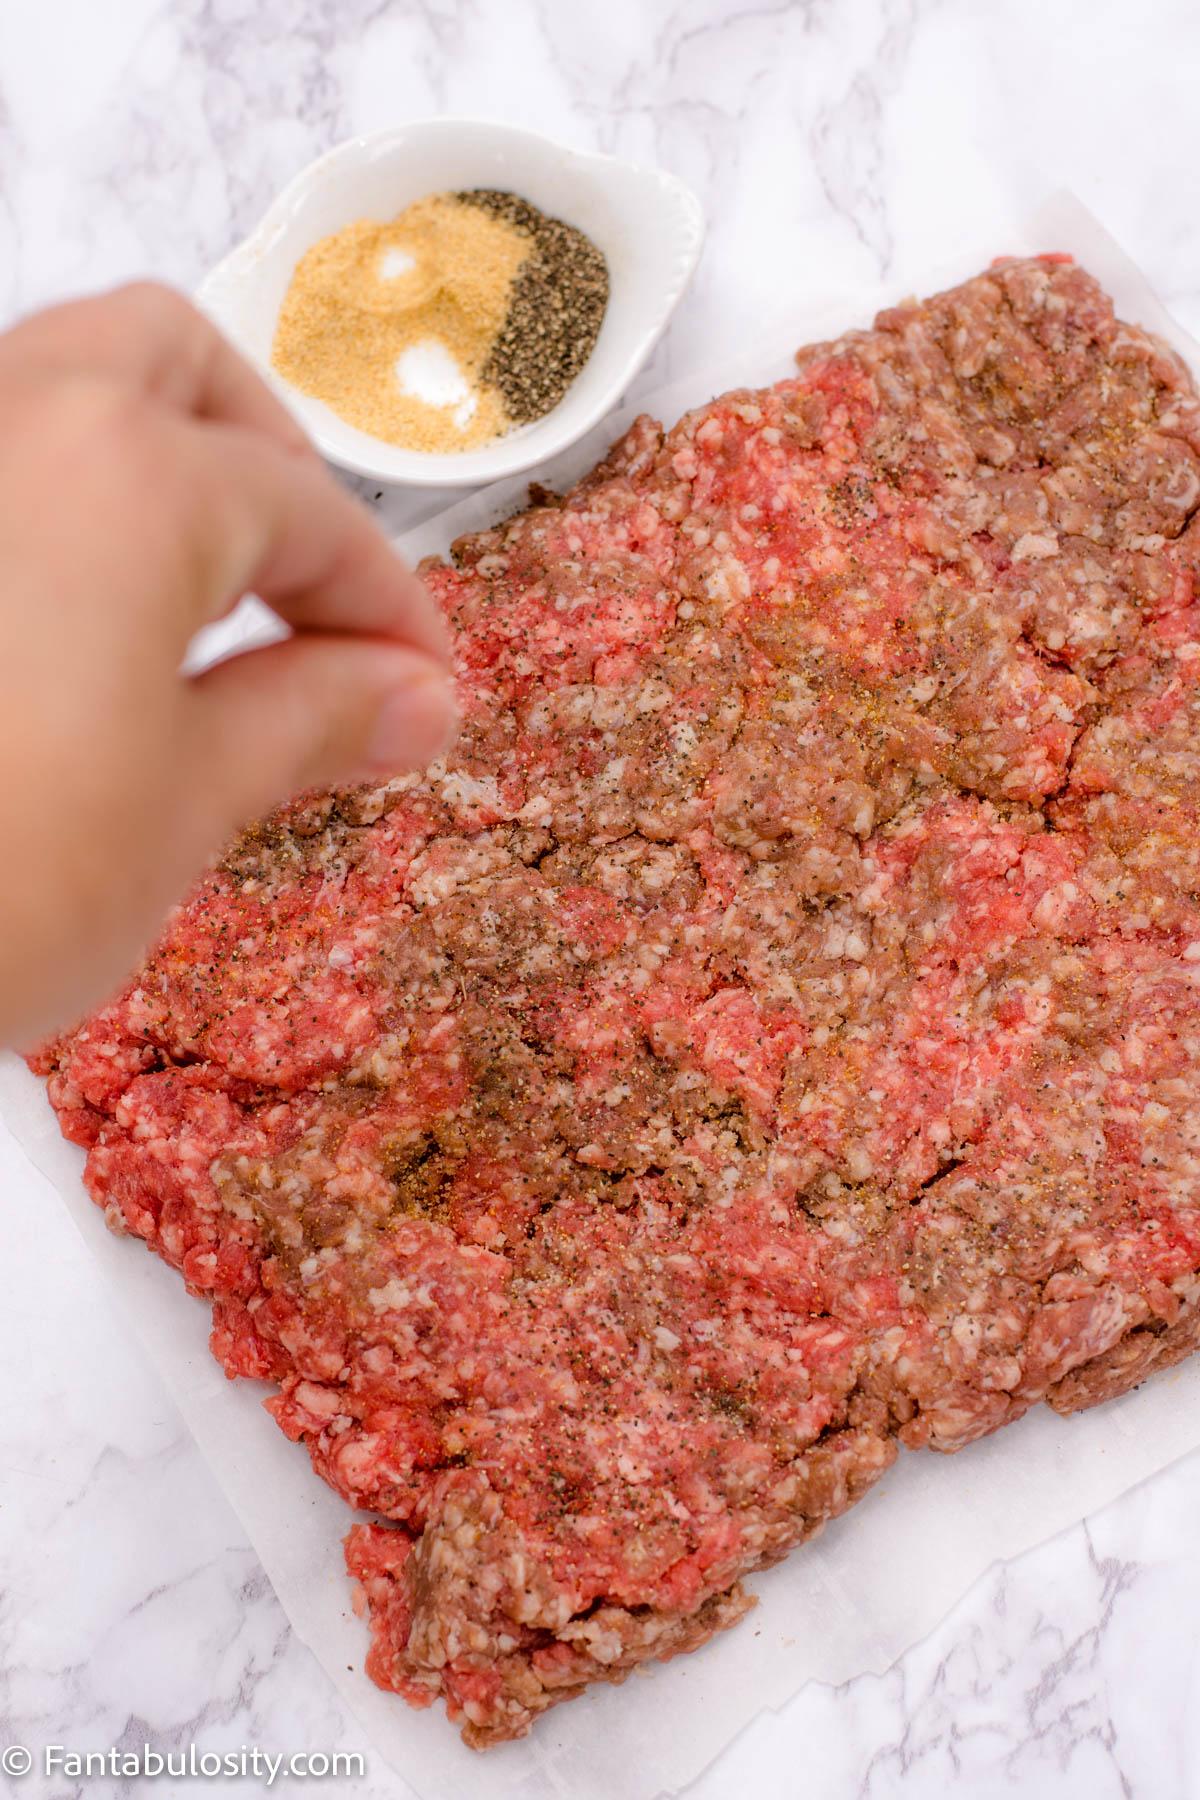 season burger sliders with seasoned salt and pepper